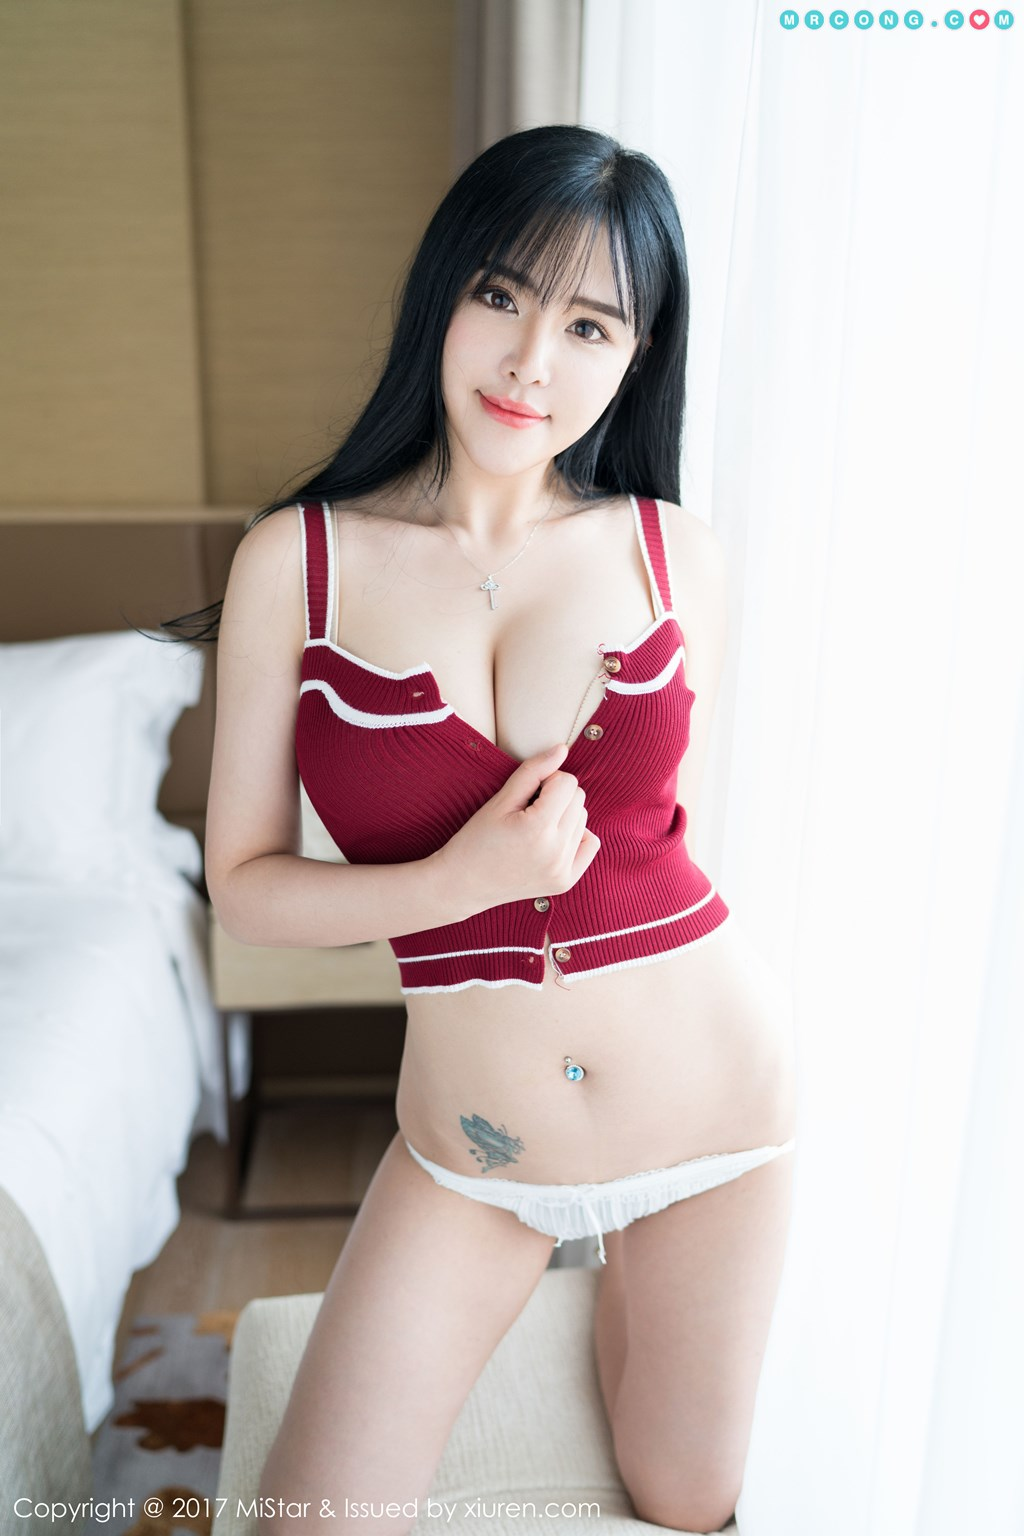 YouMi Vol.082: Model Liu Yu Er (刘 钰 儿) (49 photos)